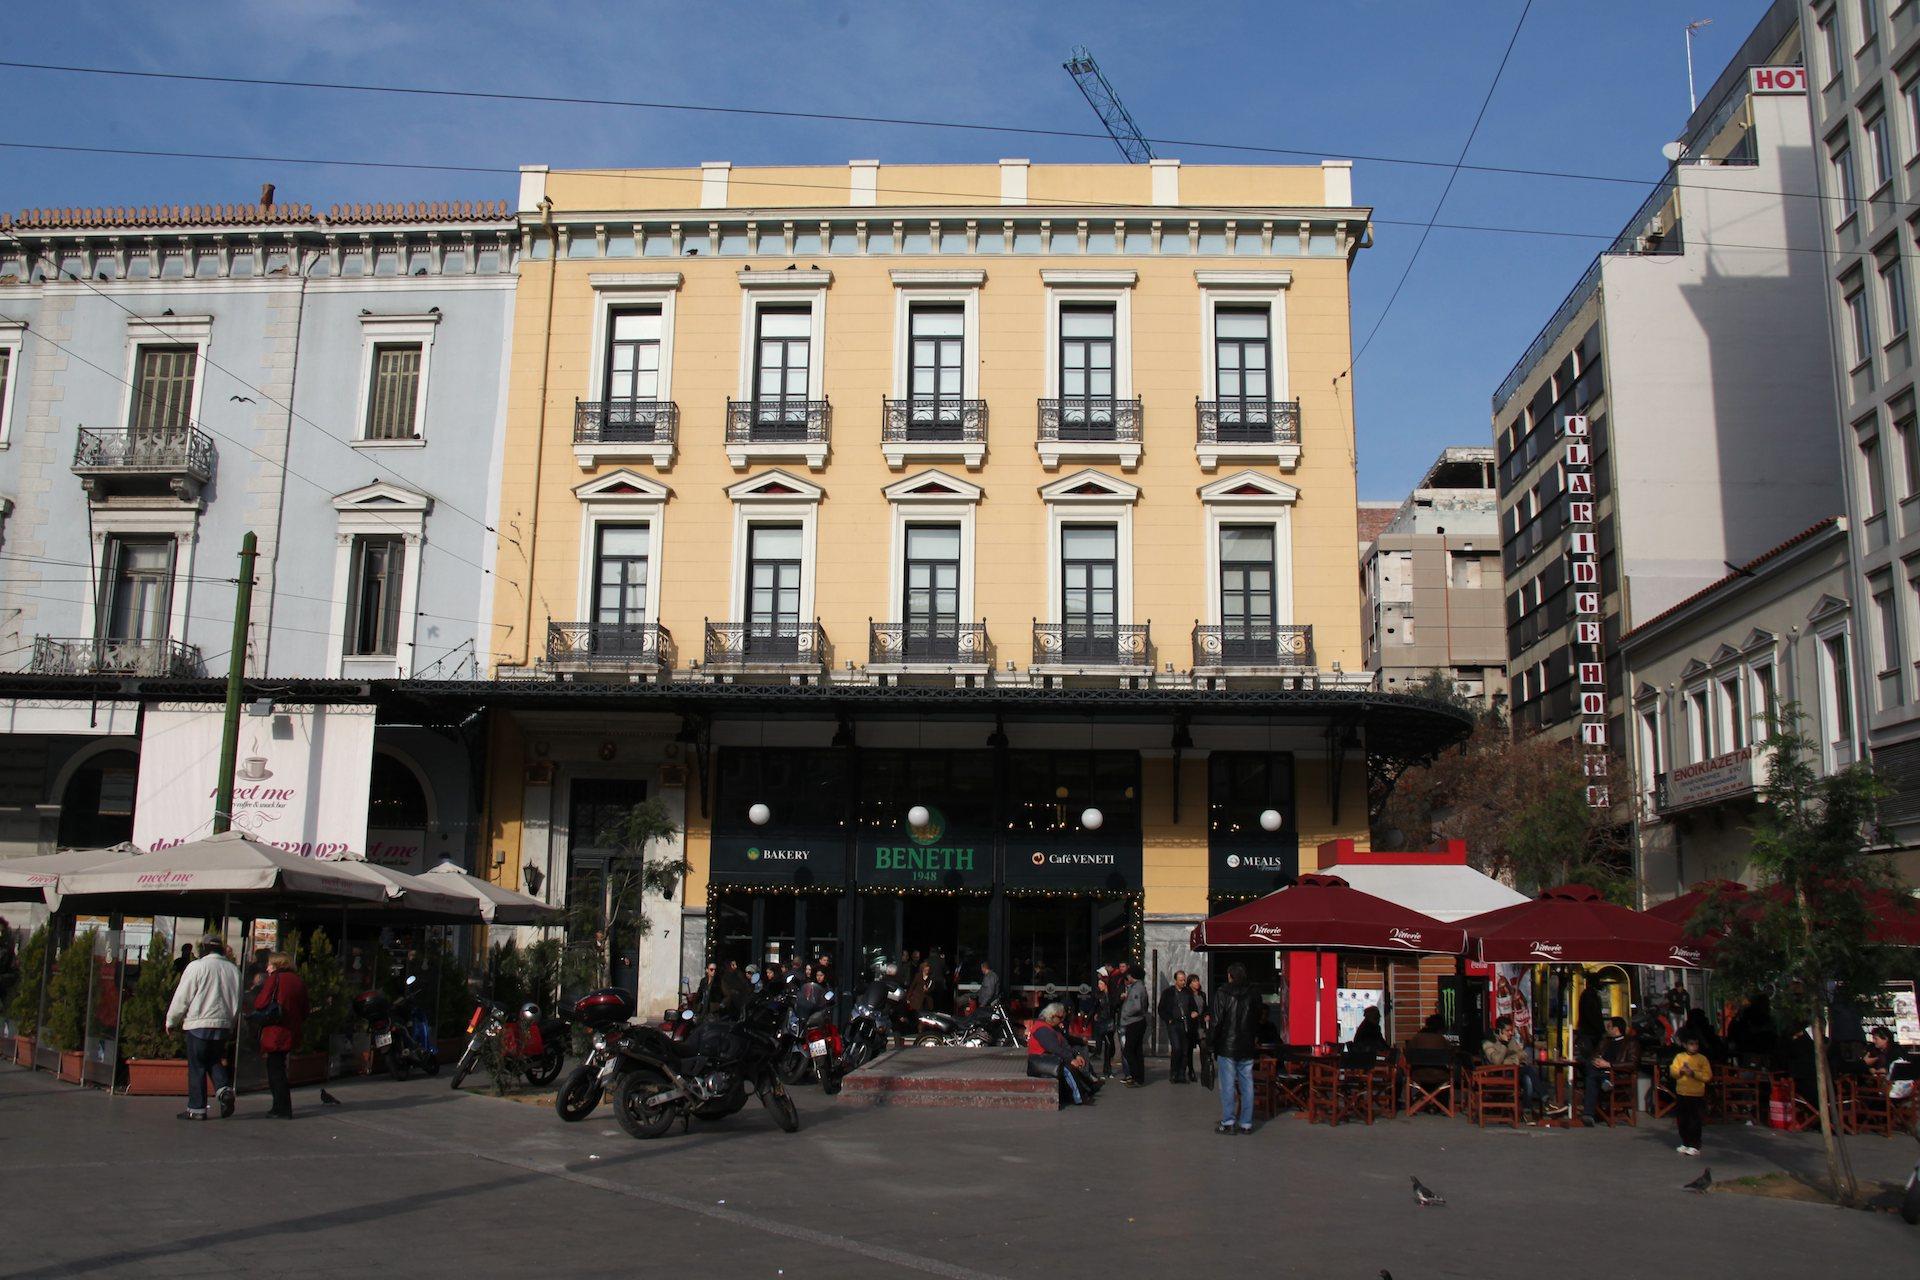 Neon cafe, Venetis Bakery, opening, Καφέ Νέον, εγκαίνια, Βενέτης, φούρνος